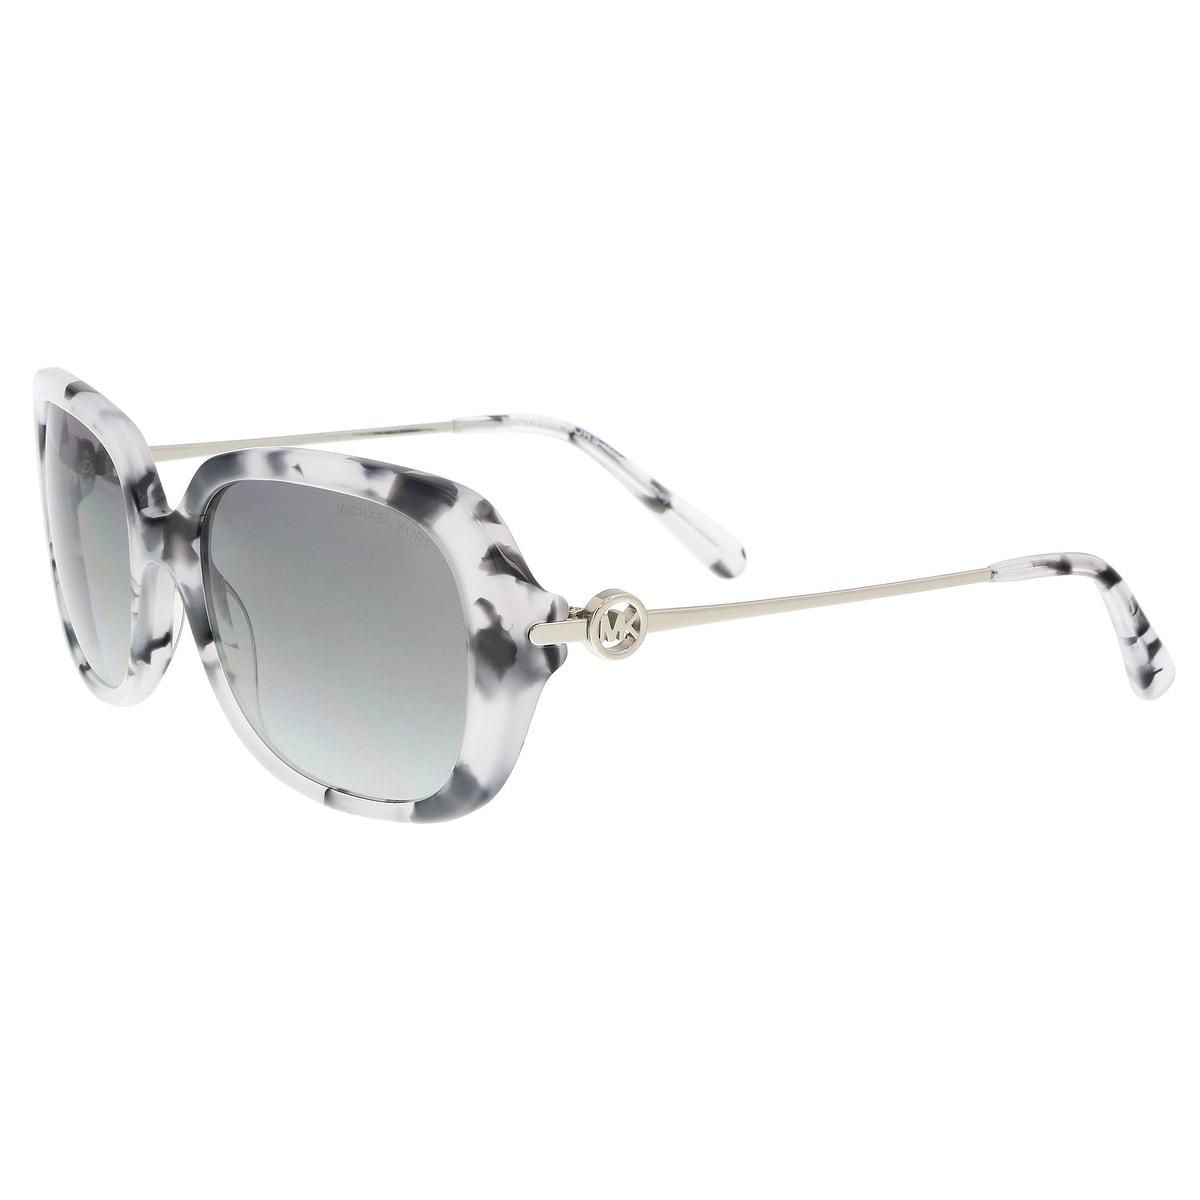 65d1a978981 Michael Kors Sunglasses